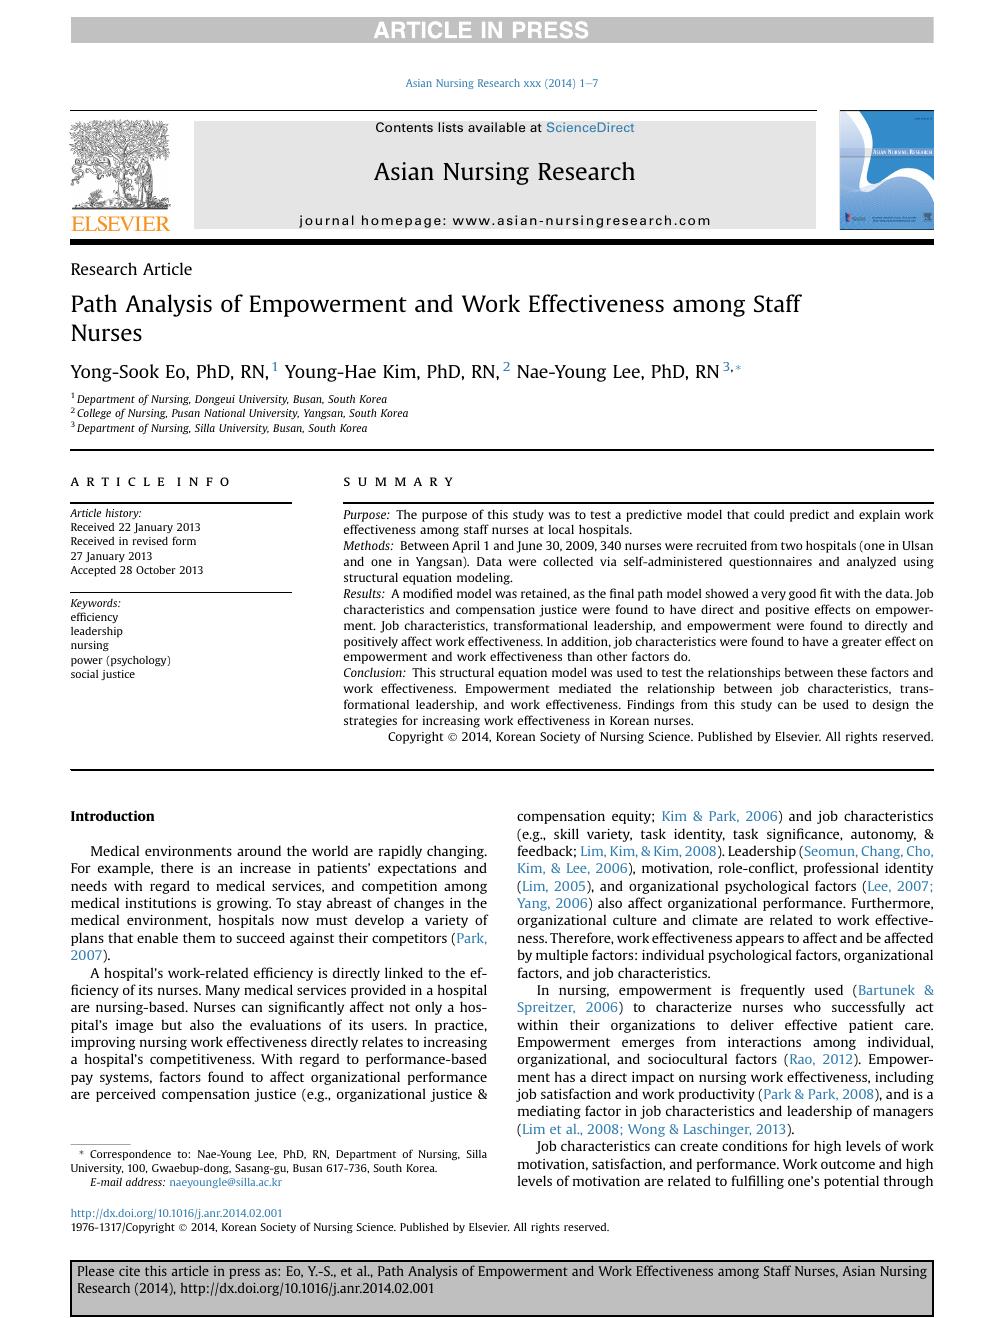 Path Analysis of Empowerment and Work Effectiveness among Staff